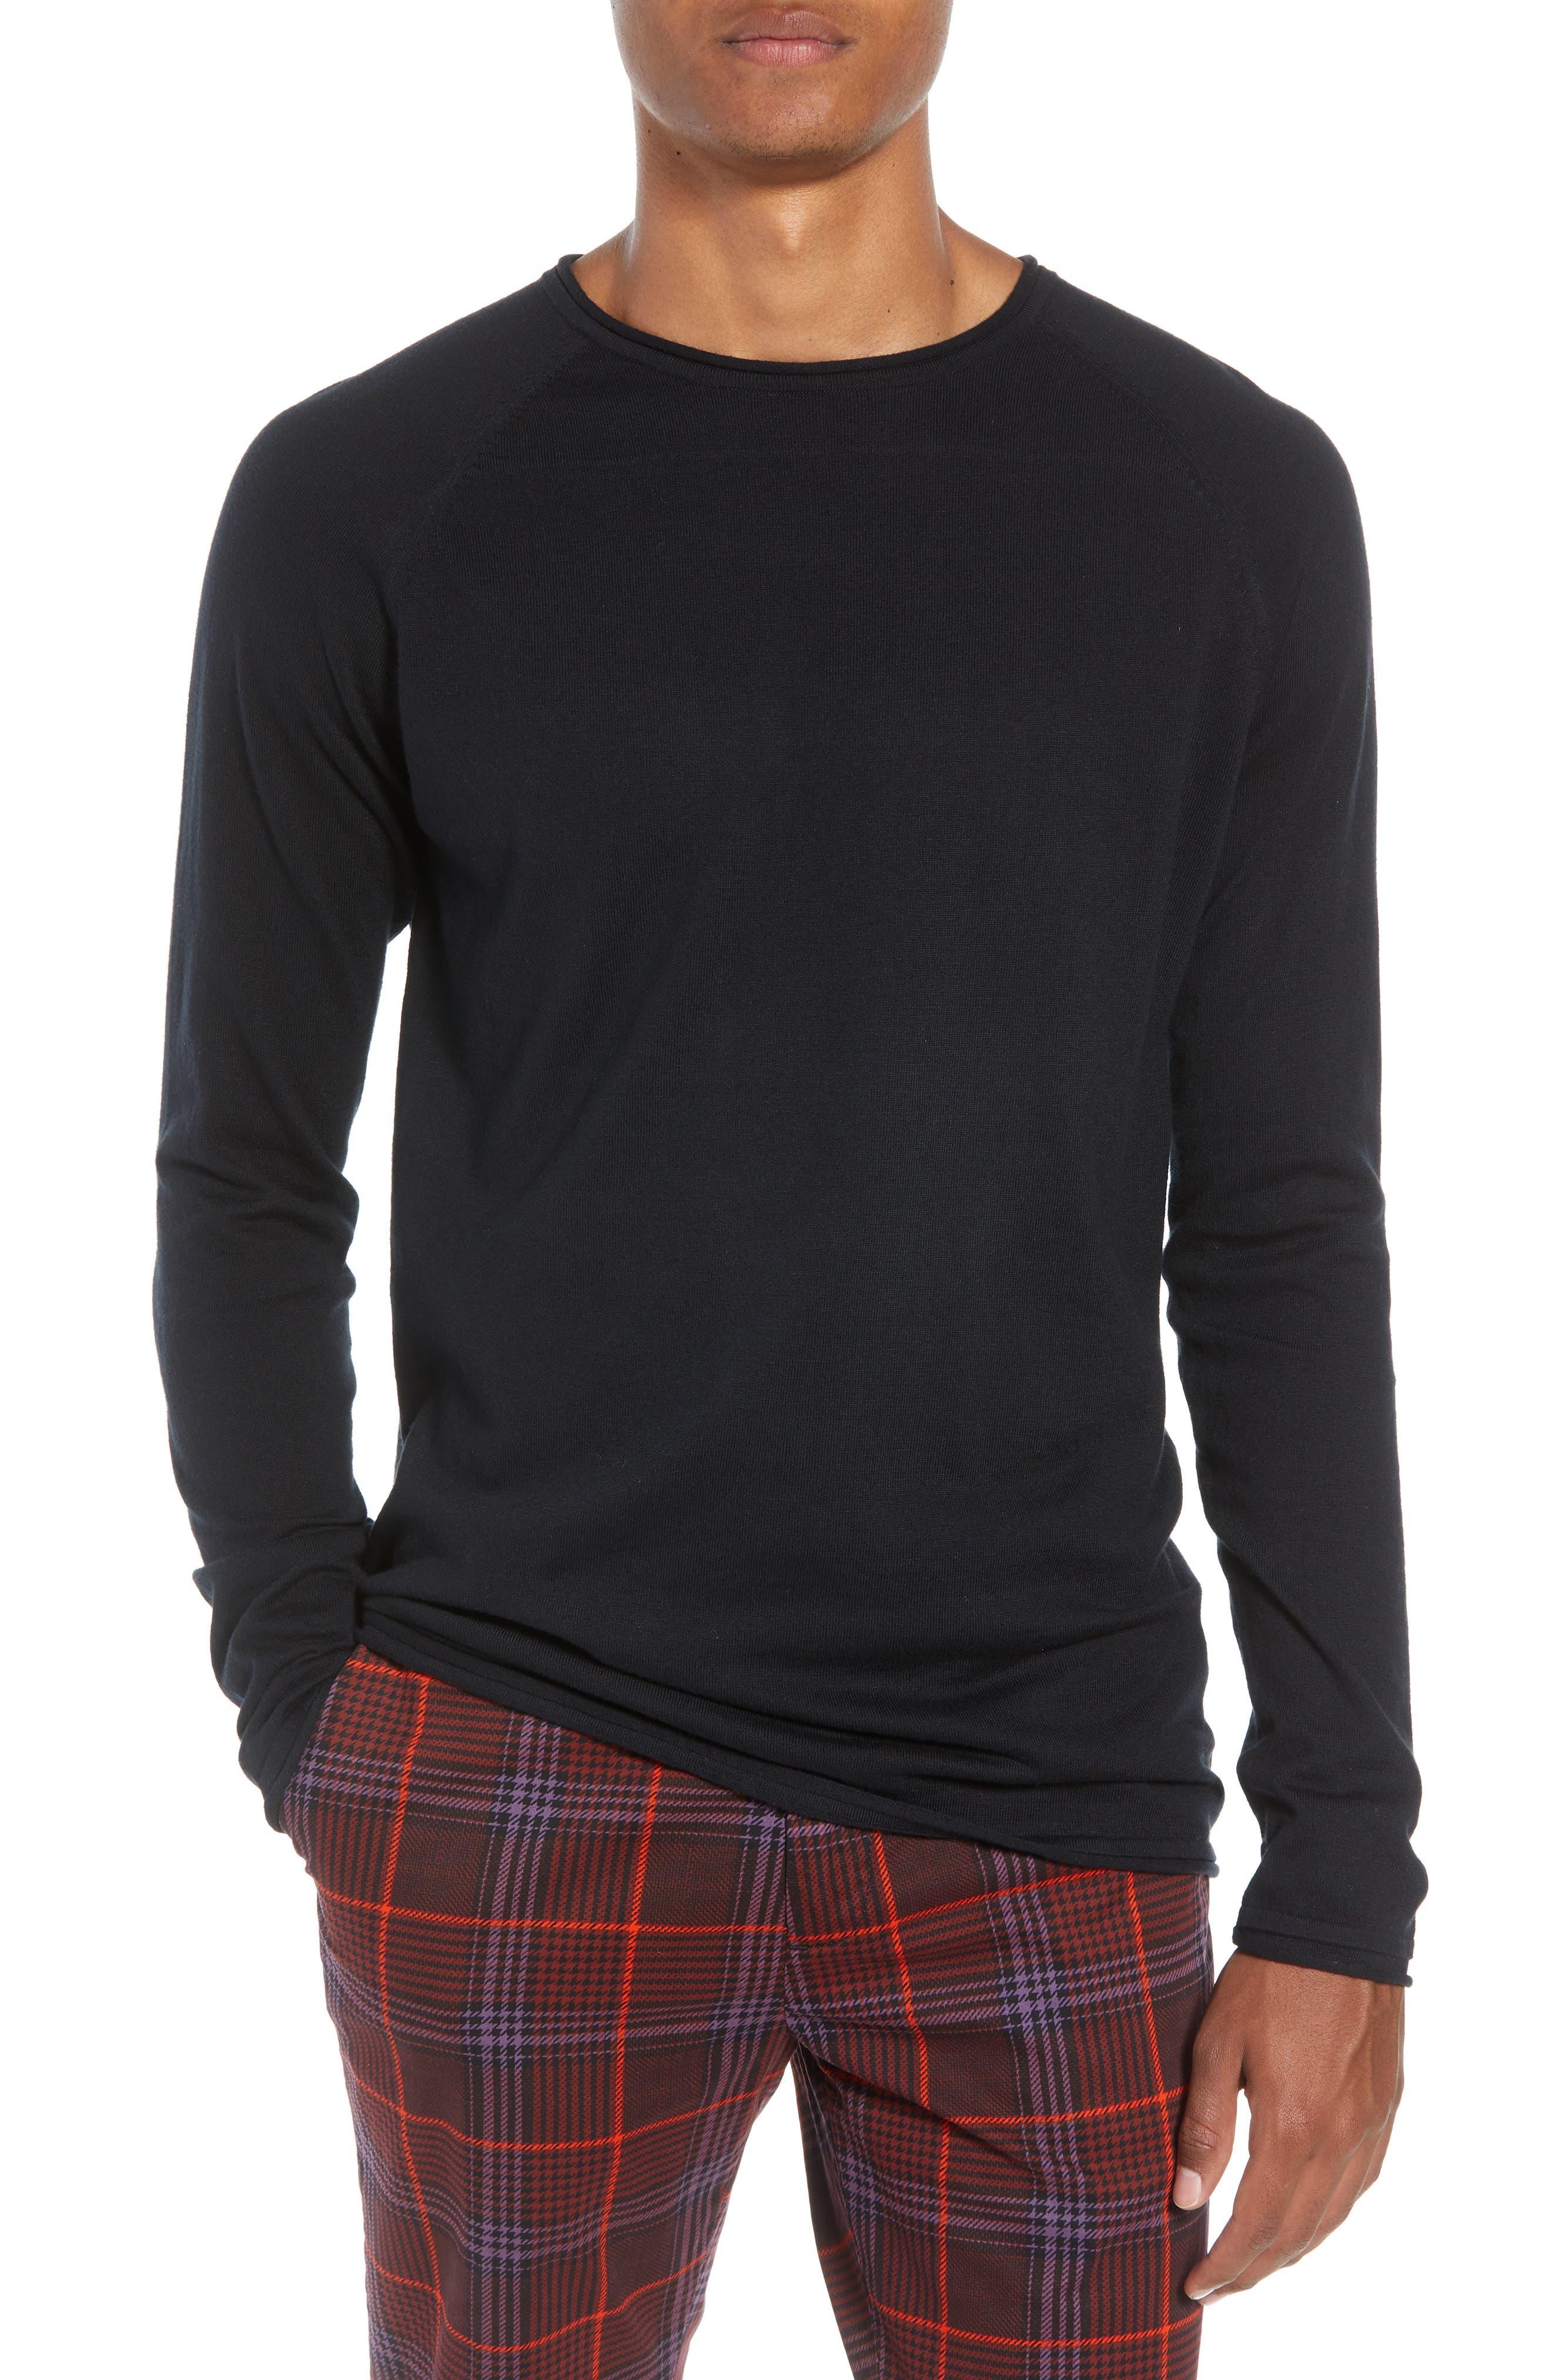 SCOTCH & SODA Crewneck Sweatshirt in Black